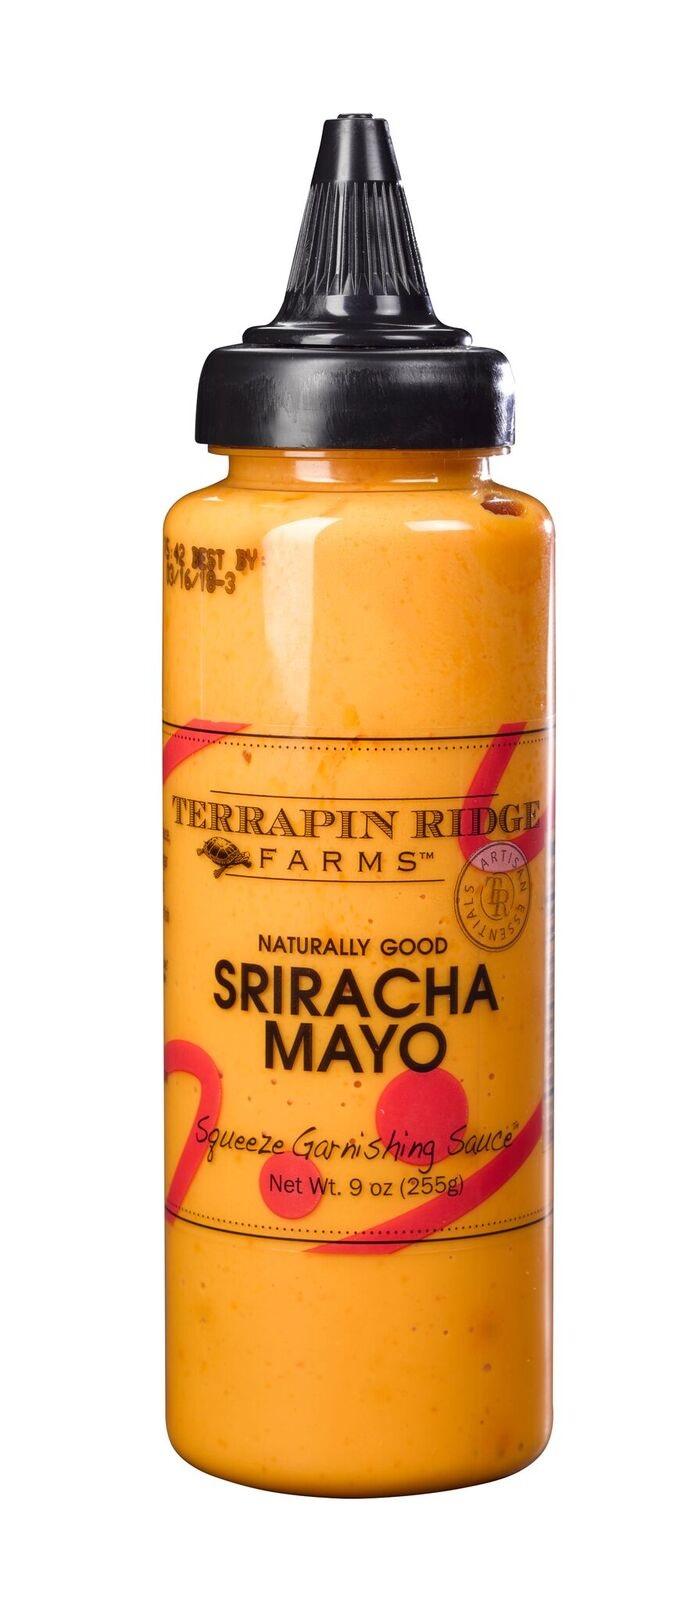 SRIRACHA MAYO GARNISHING SQUEEZE